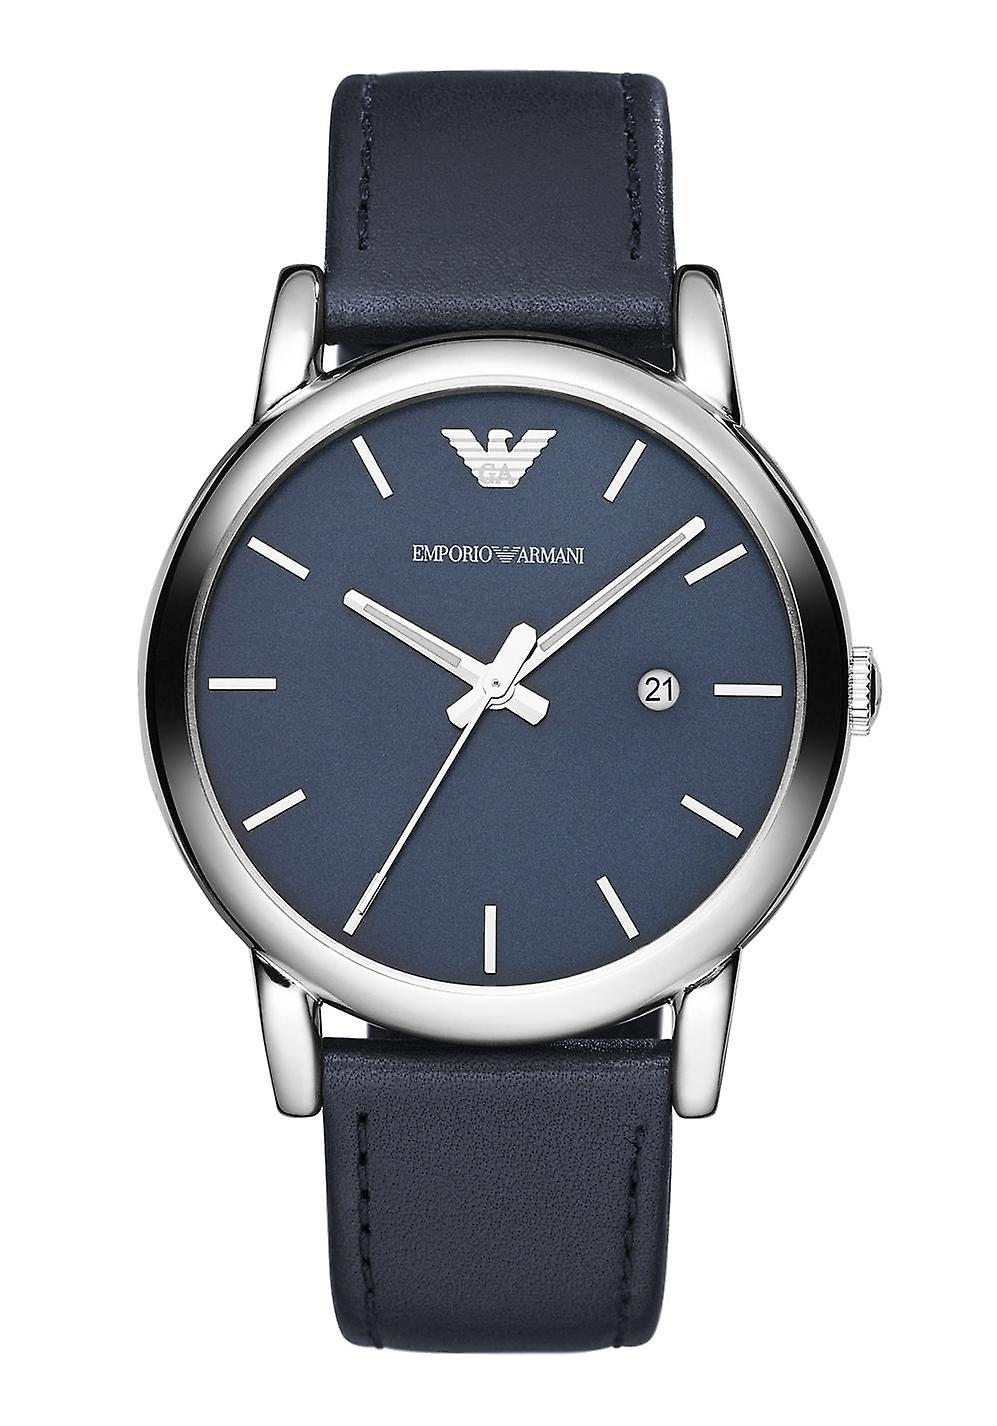 Emporio Armani Ar1731 Classic Blue Dial Black Leather Men's Watch